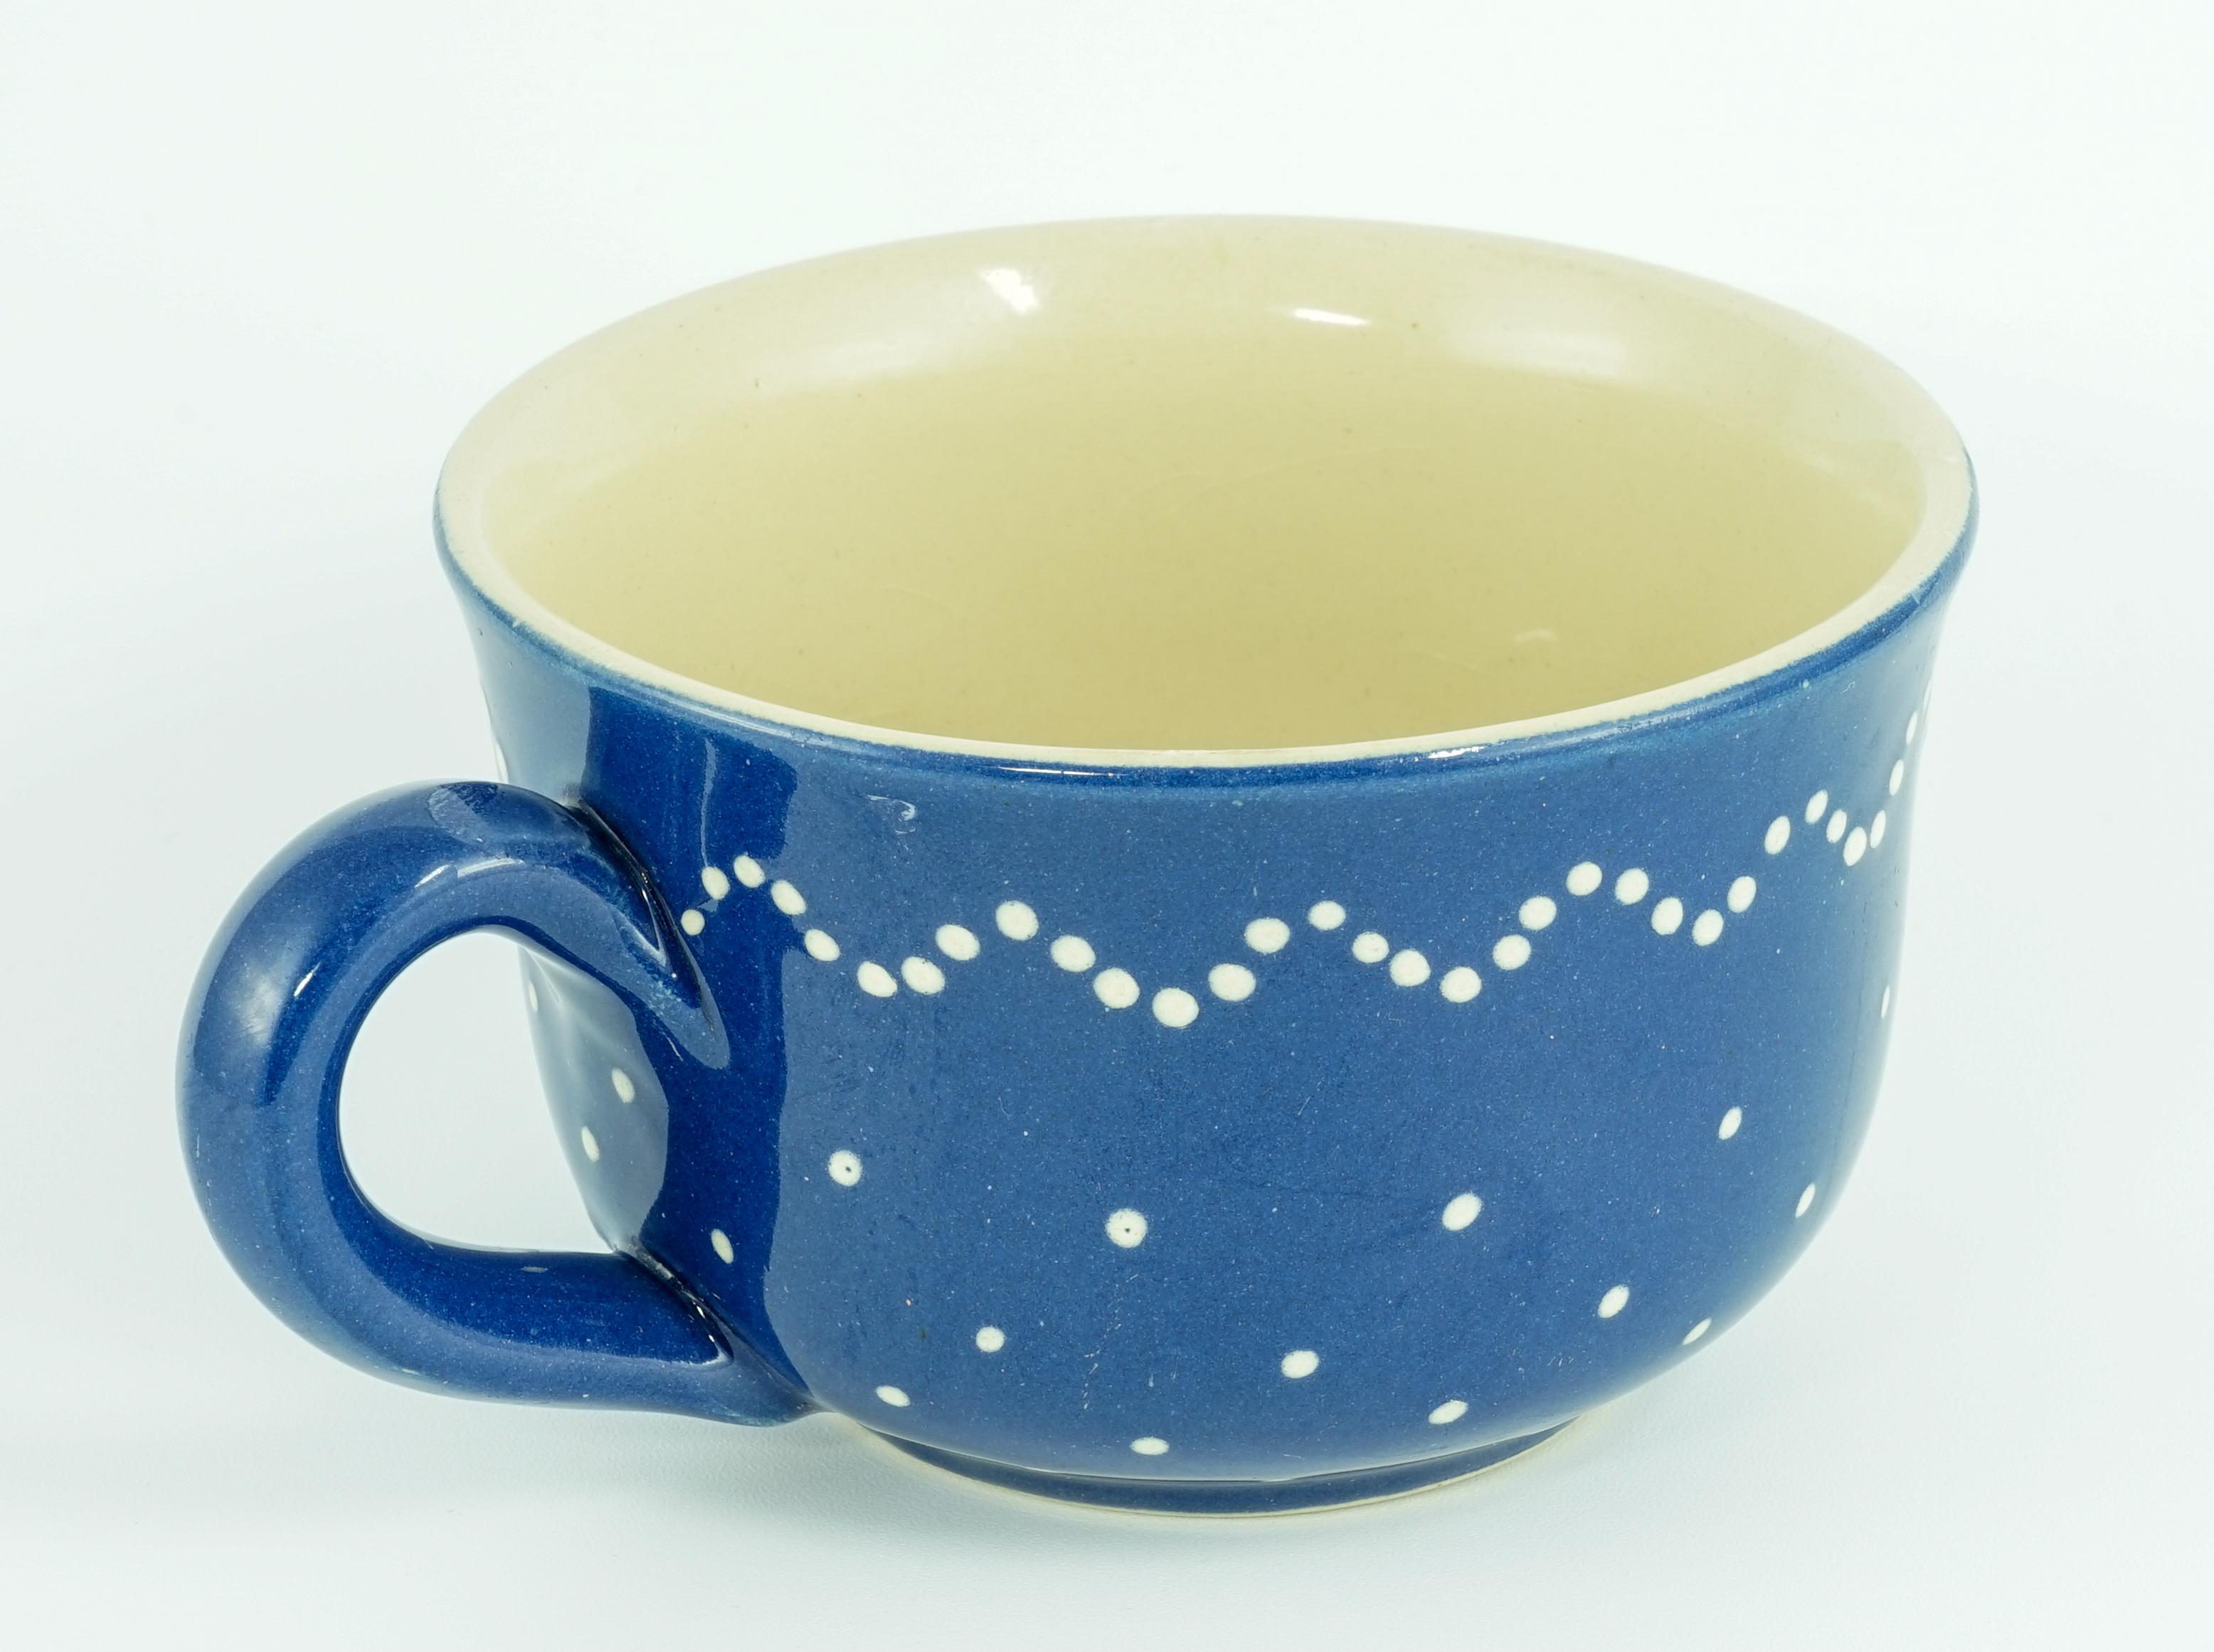 File:Ceramic cups DSC03538-2.jpg - Wikimedia Commons